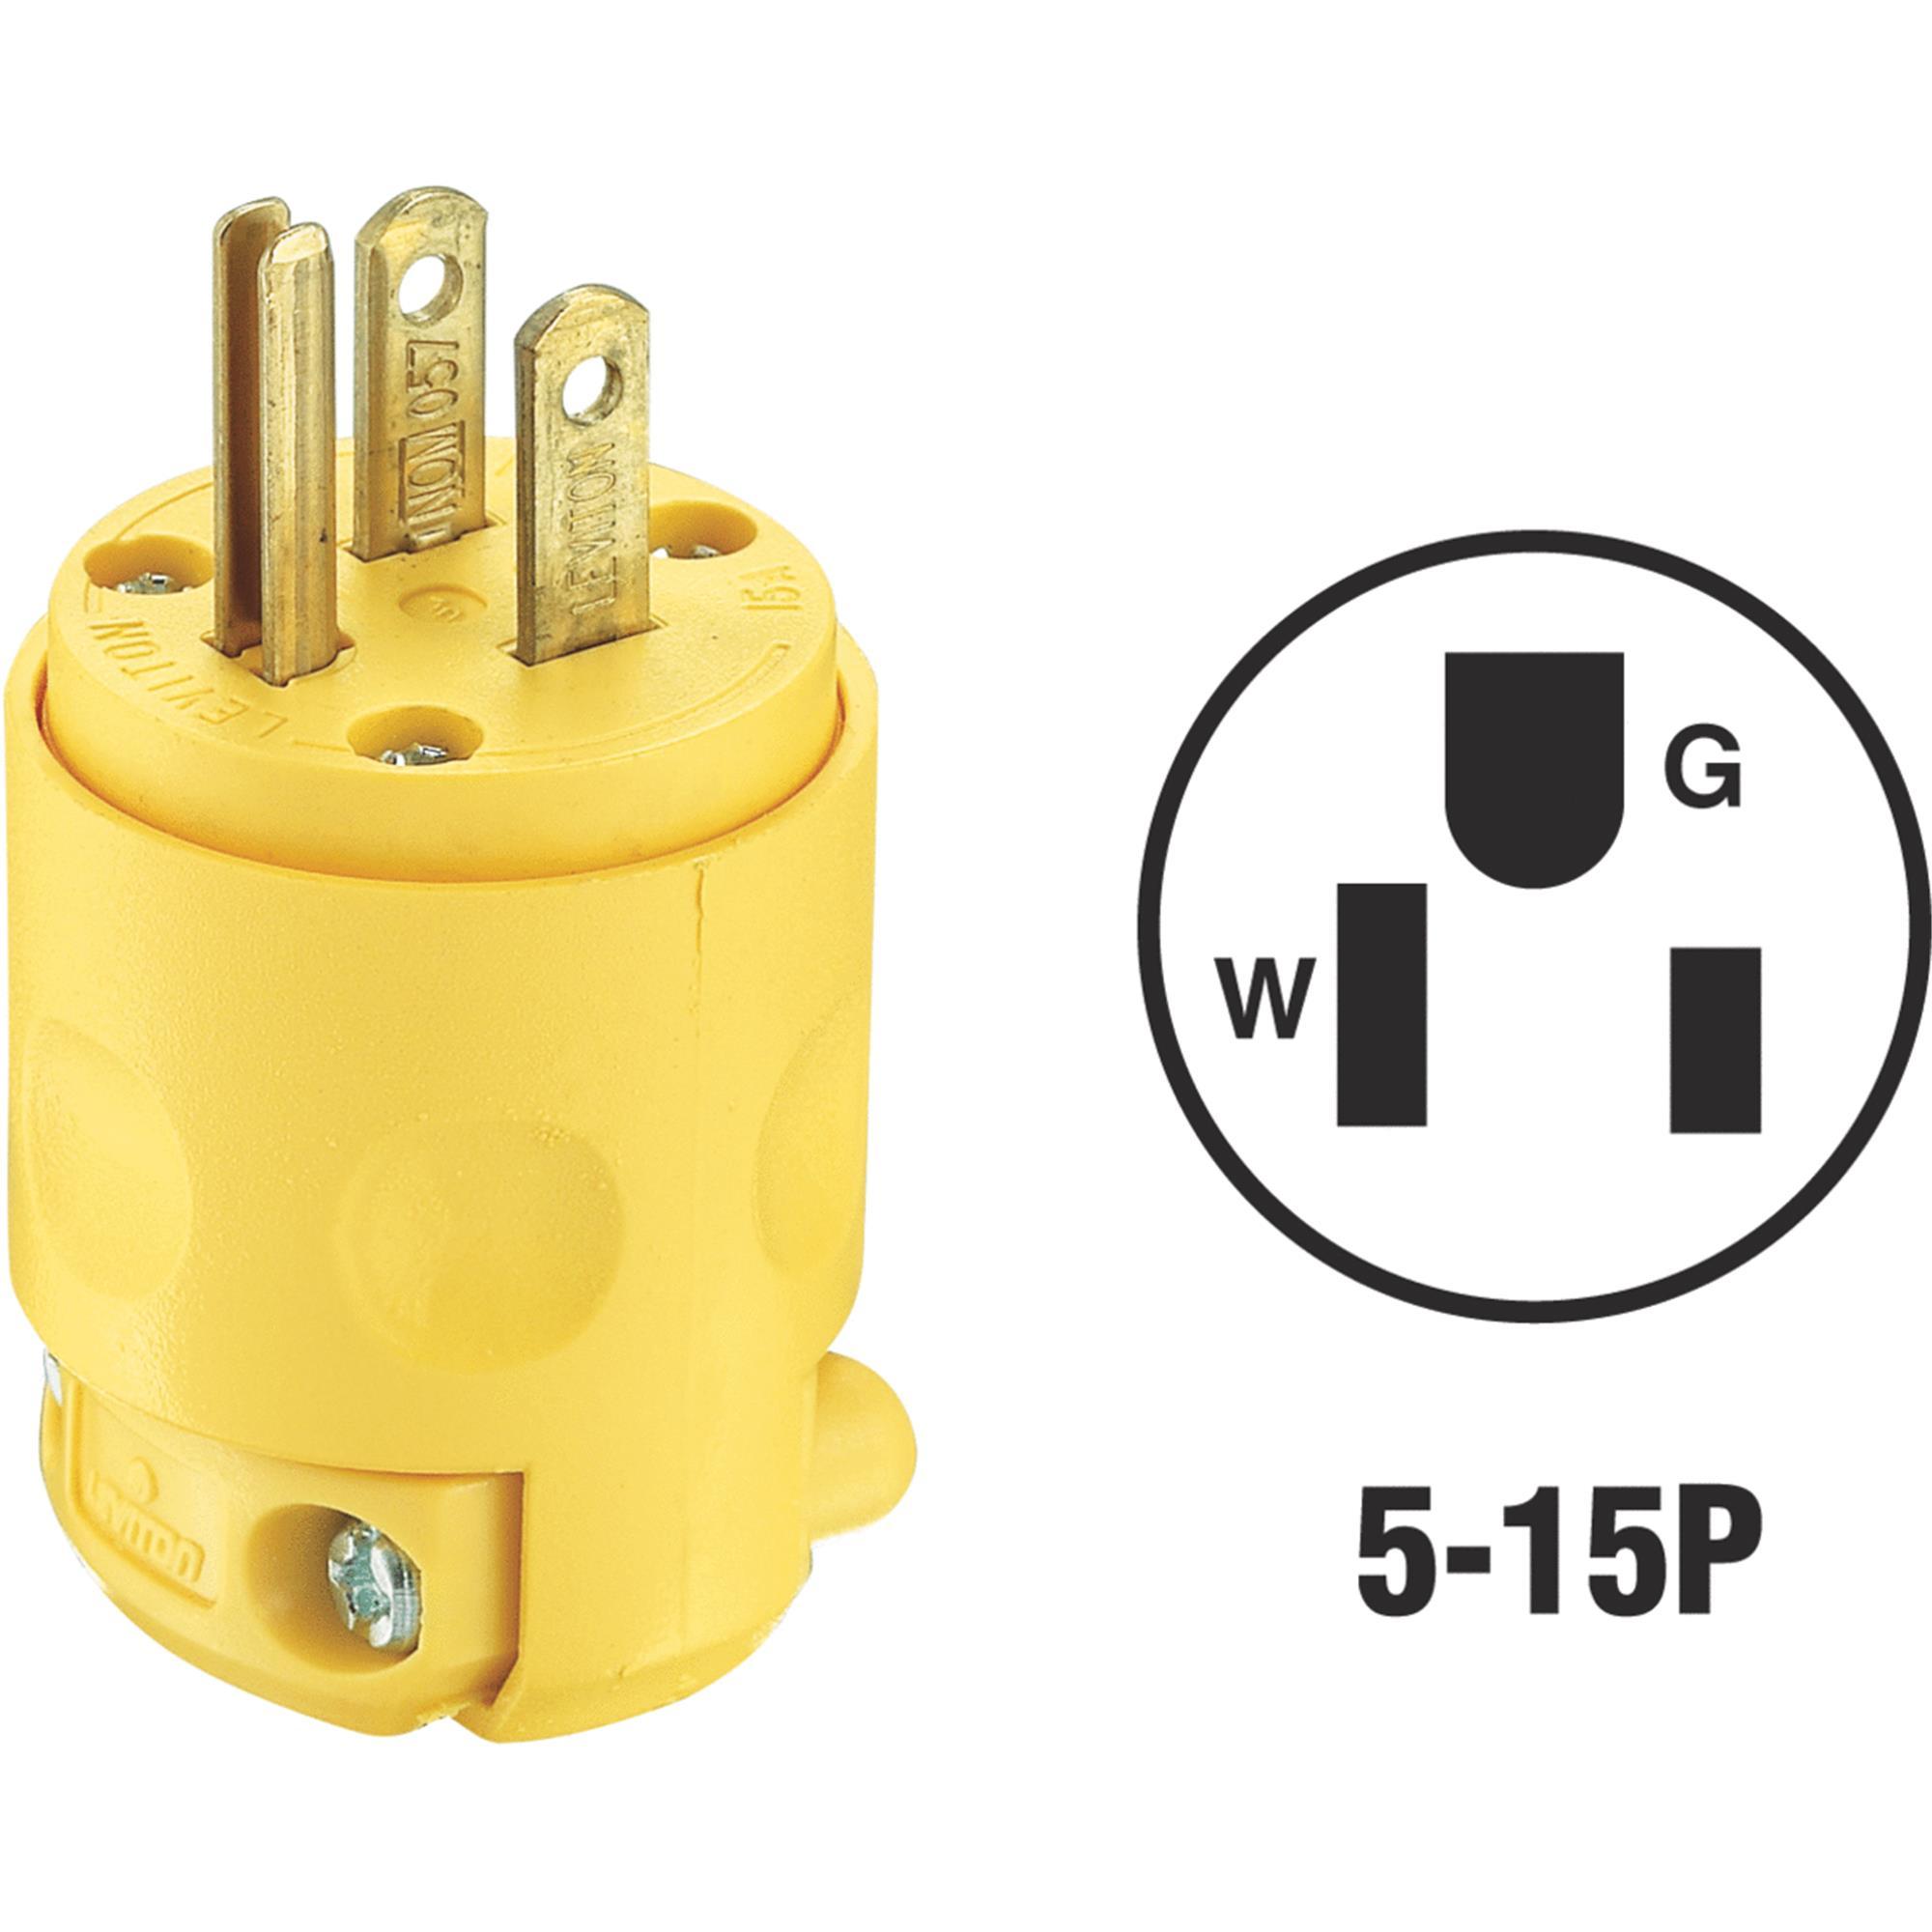 Leviton 515PV 3 Wire 2 Pole Polarized Commercial Grade Straight Blade Plug 125 Volt 1-Phase 15 Amp NEMA 5-15P Yellow